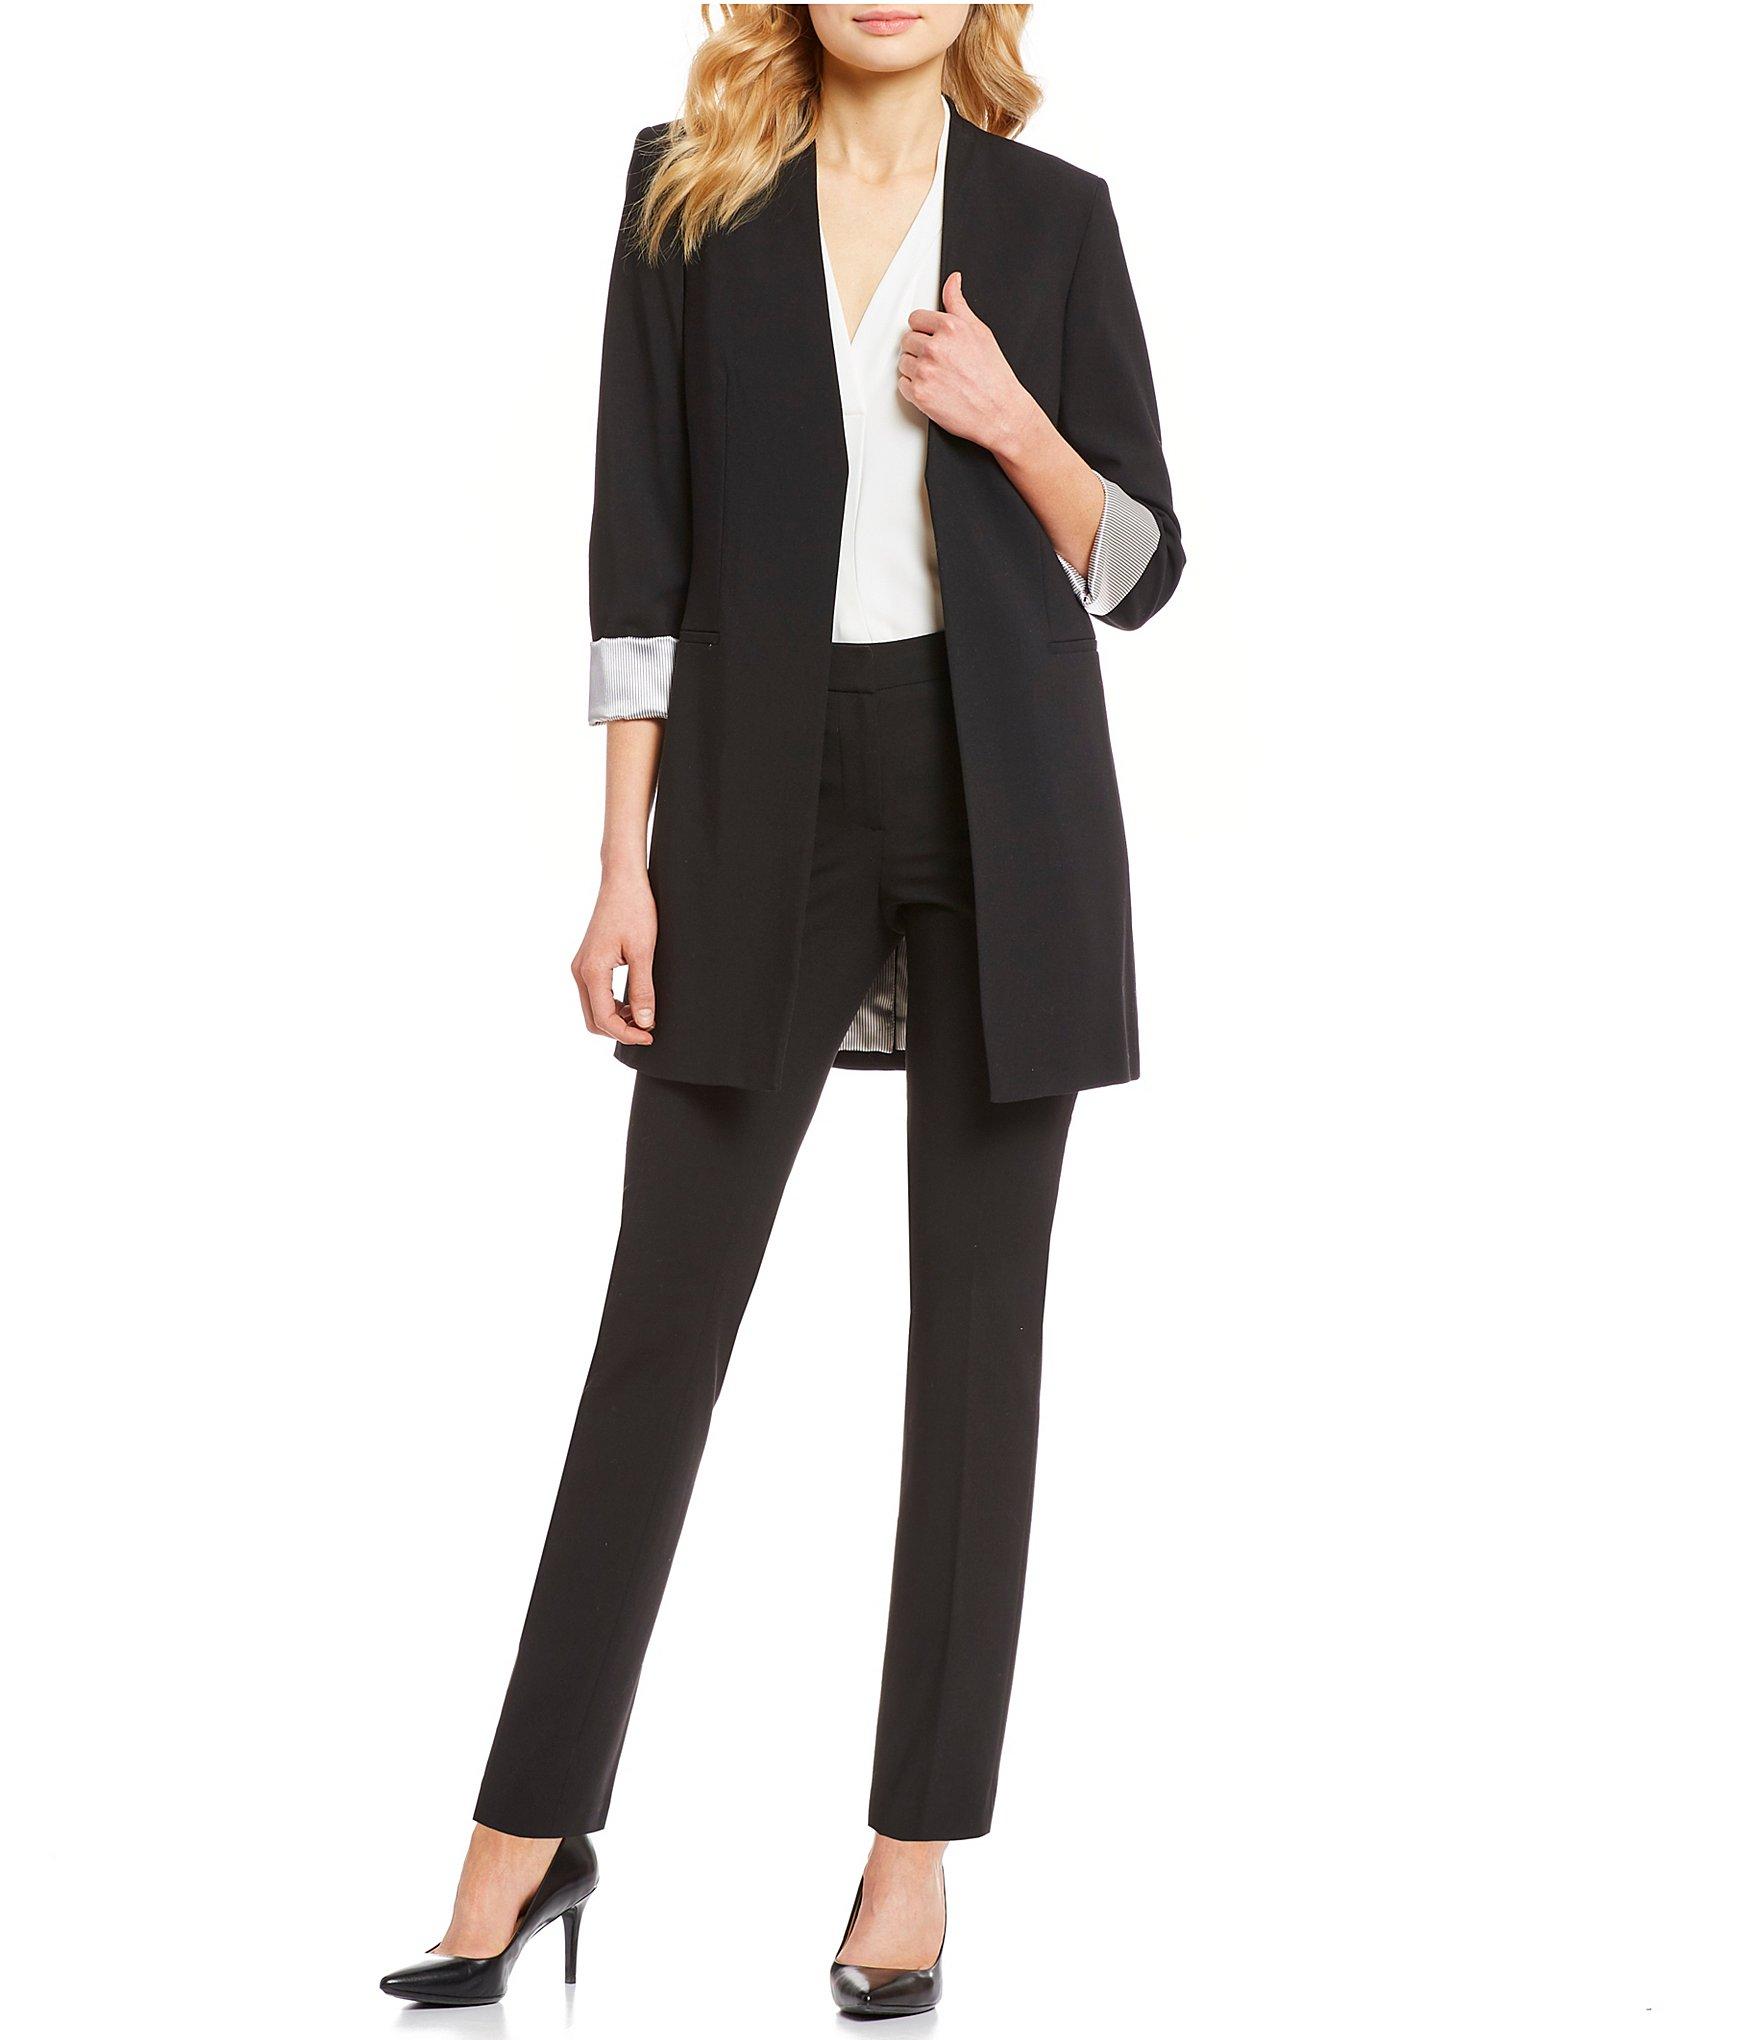 42c471001c020 Calvin Klein Satin Stripe Roll Cuff Long Open Front Jacket & Luxe Stretch  Slim Leg Pants